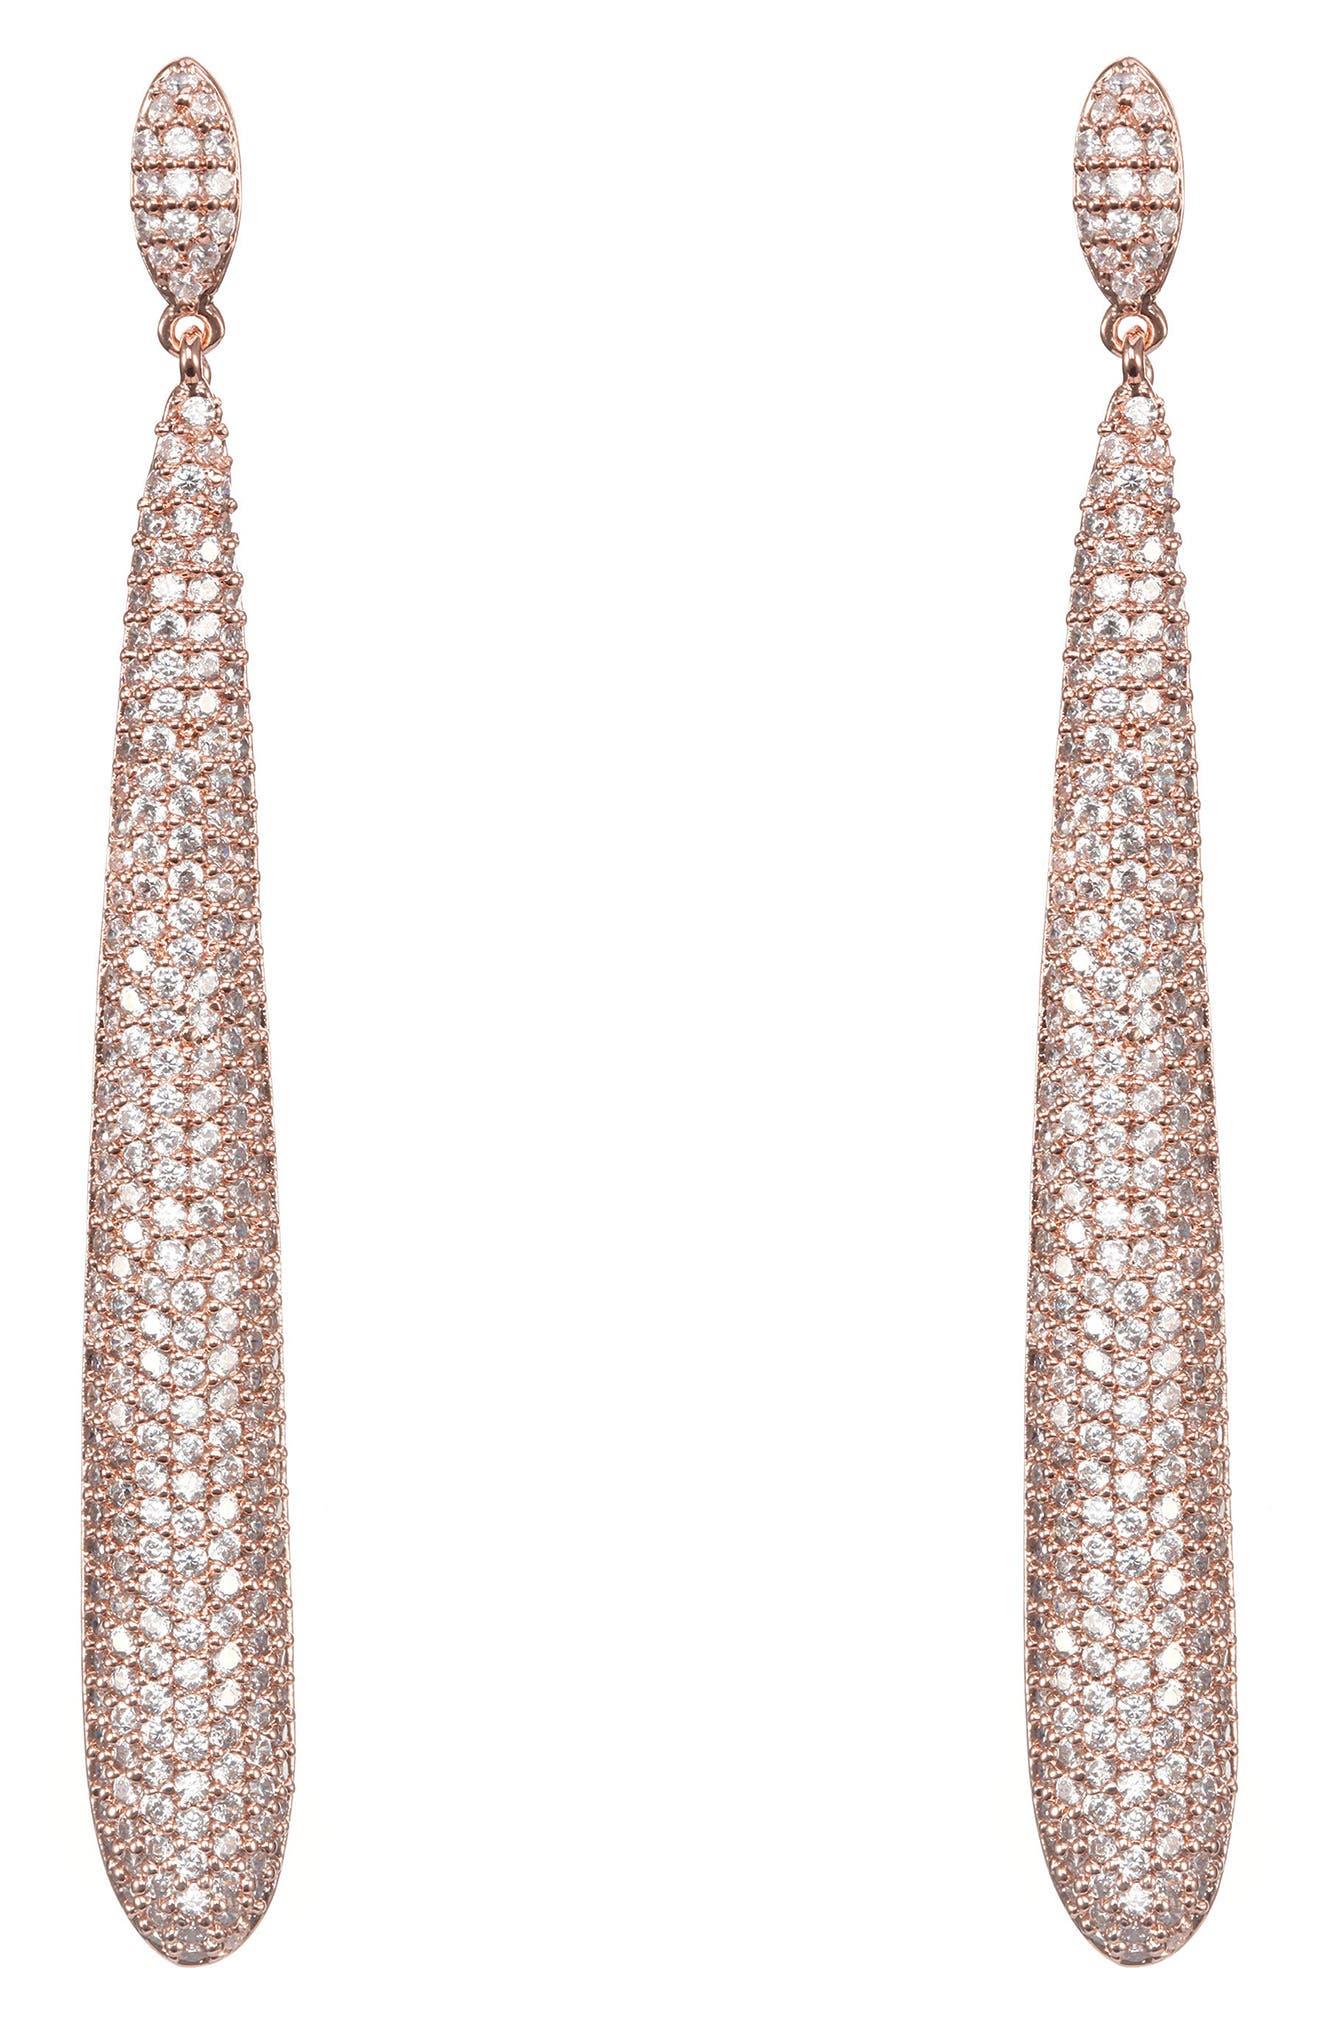 Skinny Teardrop Pavé Earrings,                             Main thumbnail 1, color,                             White/ Rose Gold